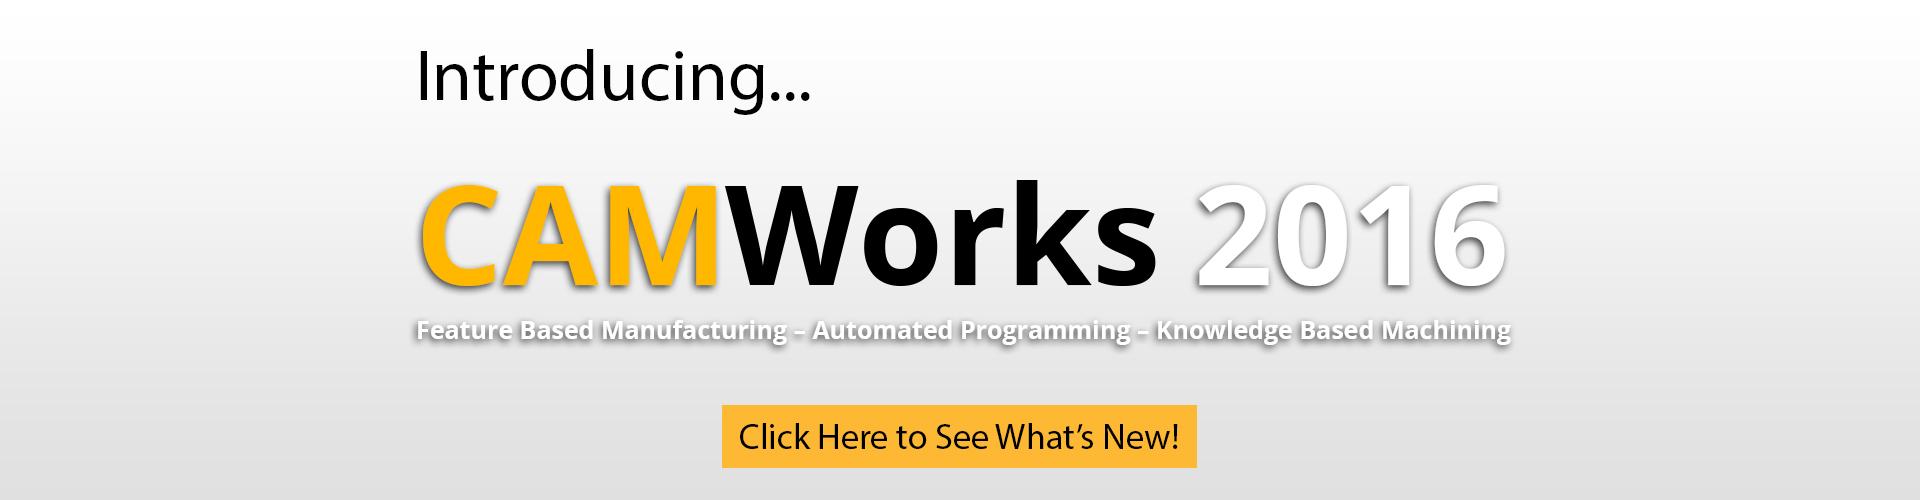 CAMWorks-2016-Banner